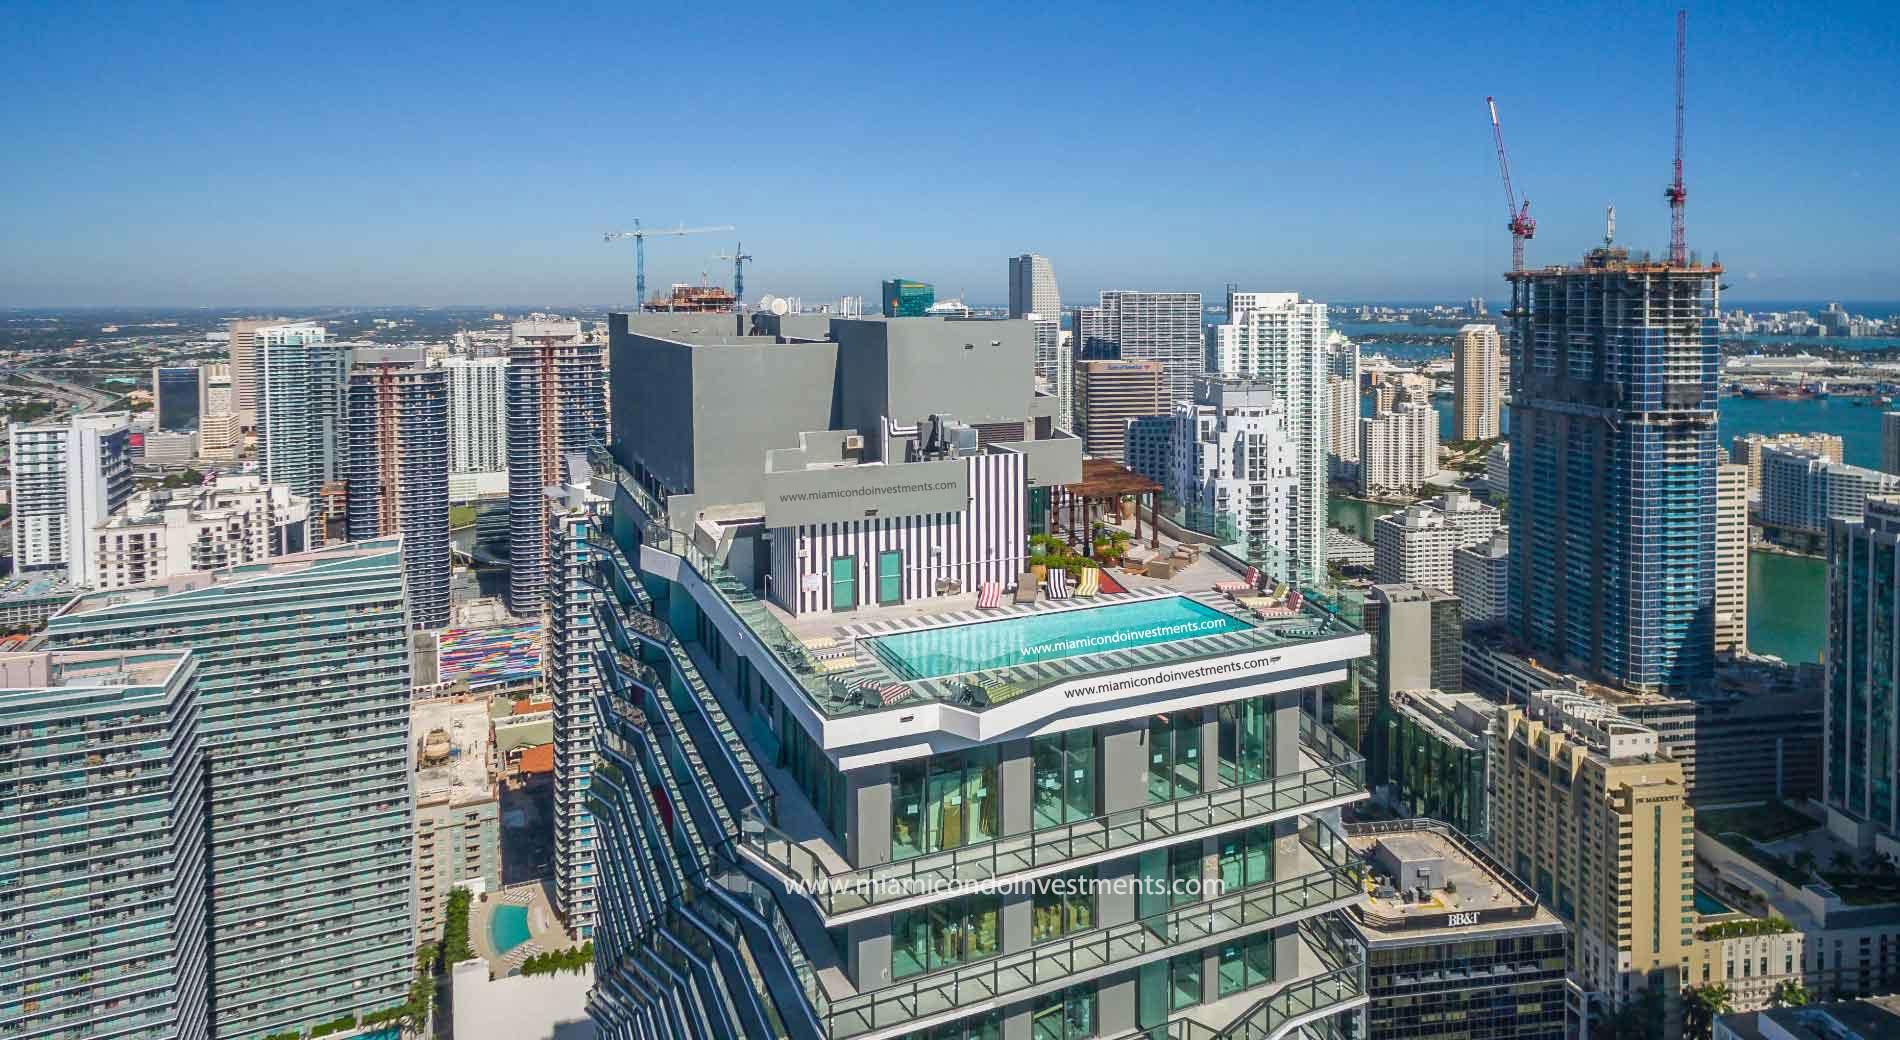 SLS Brickell penthouses